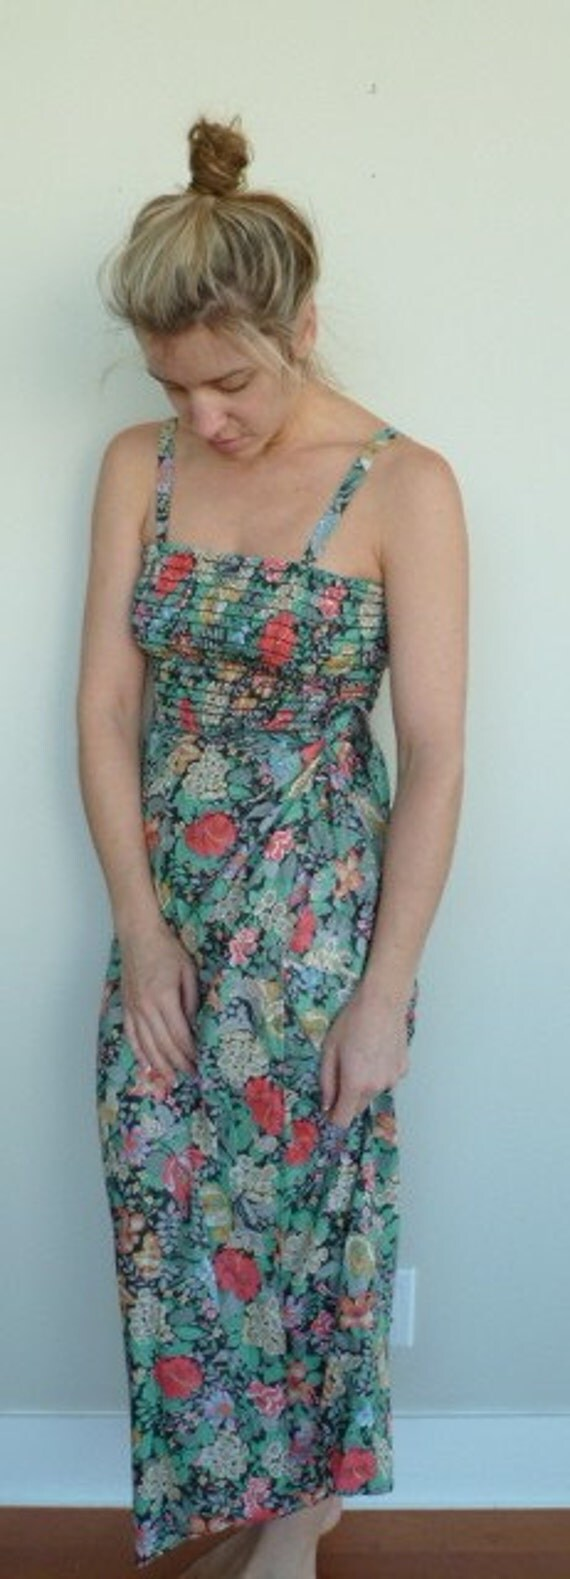 Vintage Floral Dress Printed Flower Pattern Maxi Midi Sleeveless Tube Top Long Tank